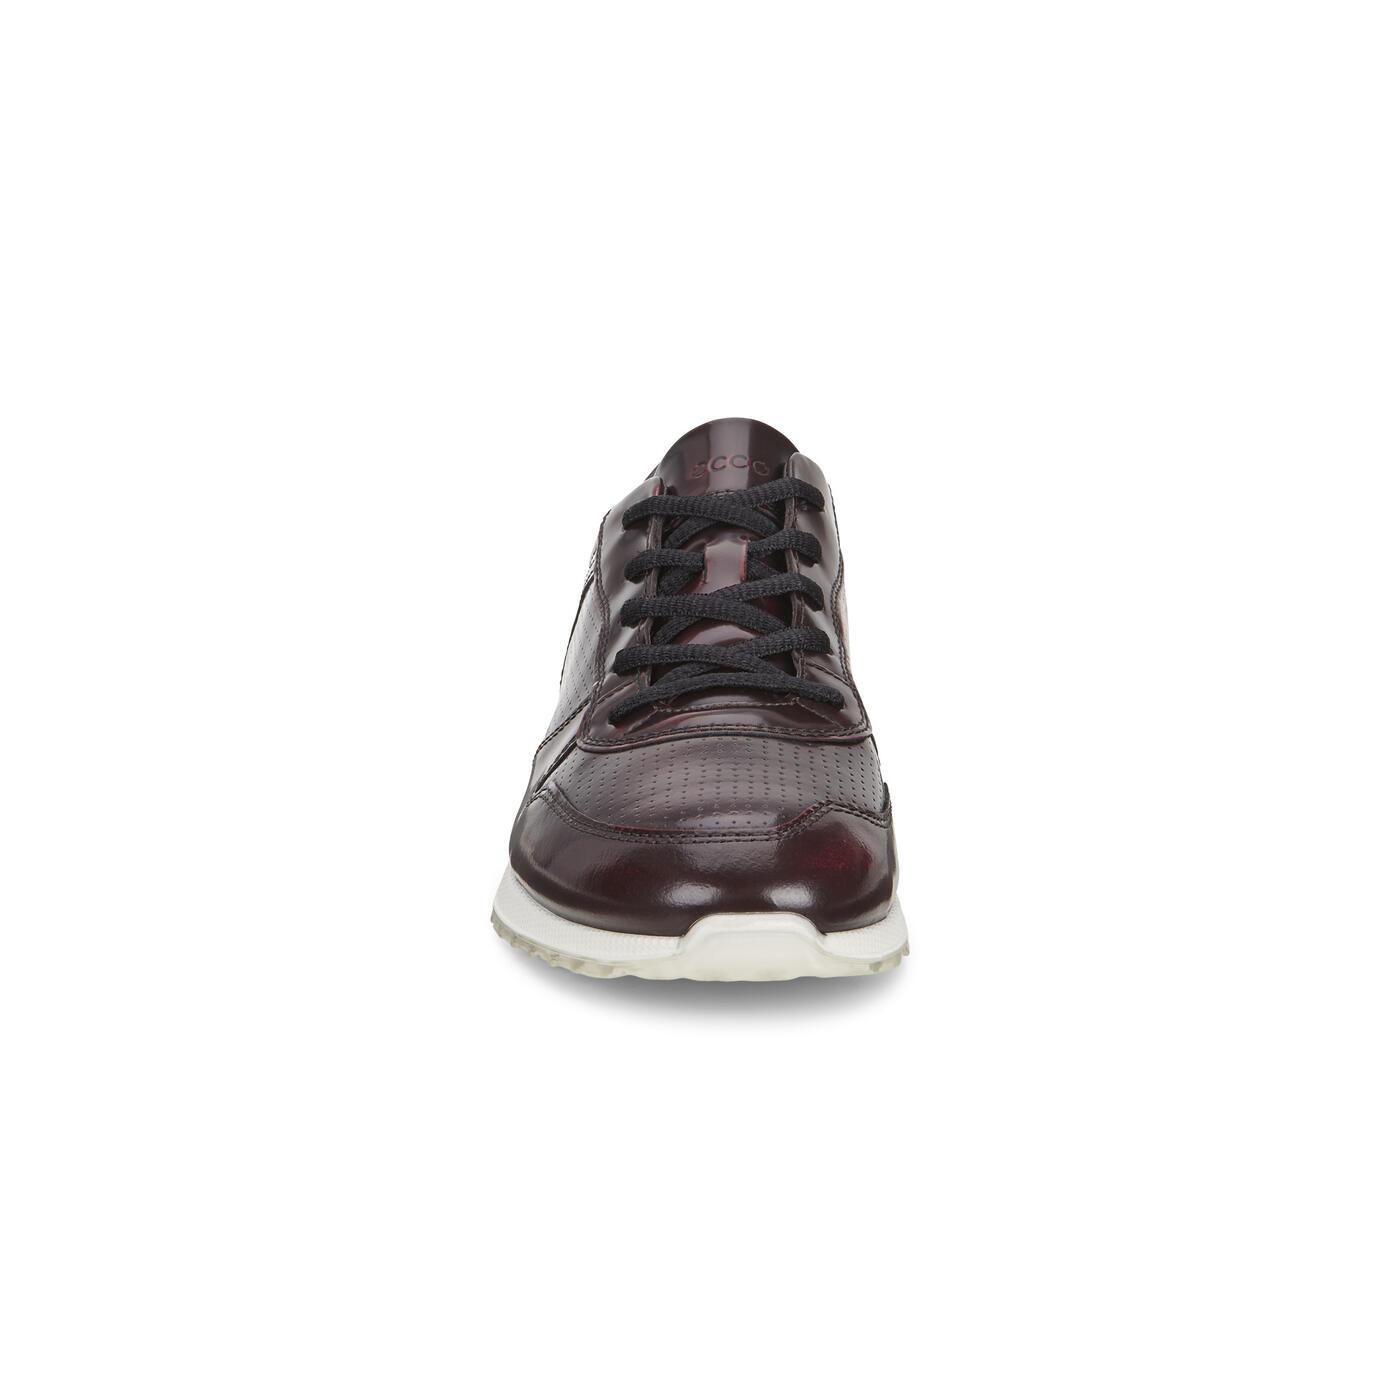 Sneaker ECCO SNEAK pour femmes